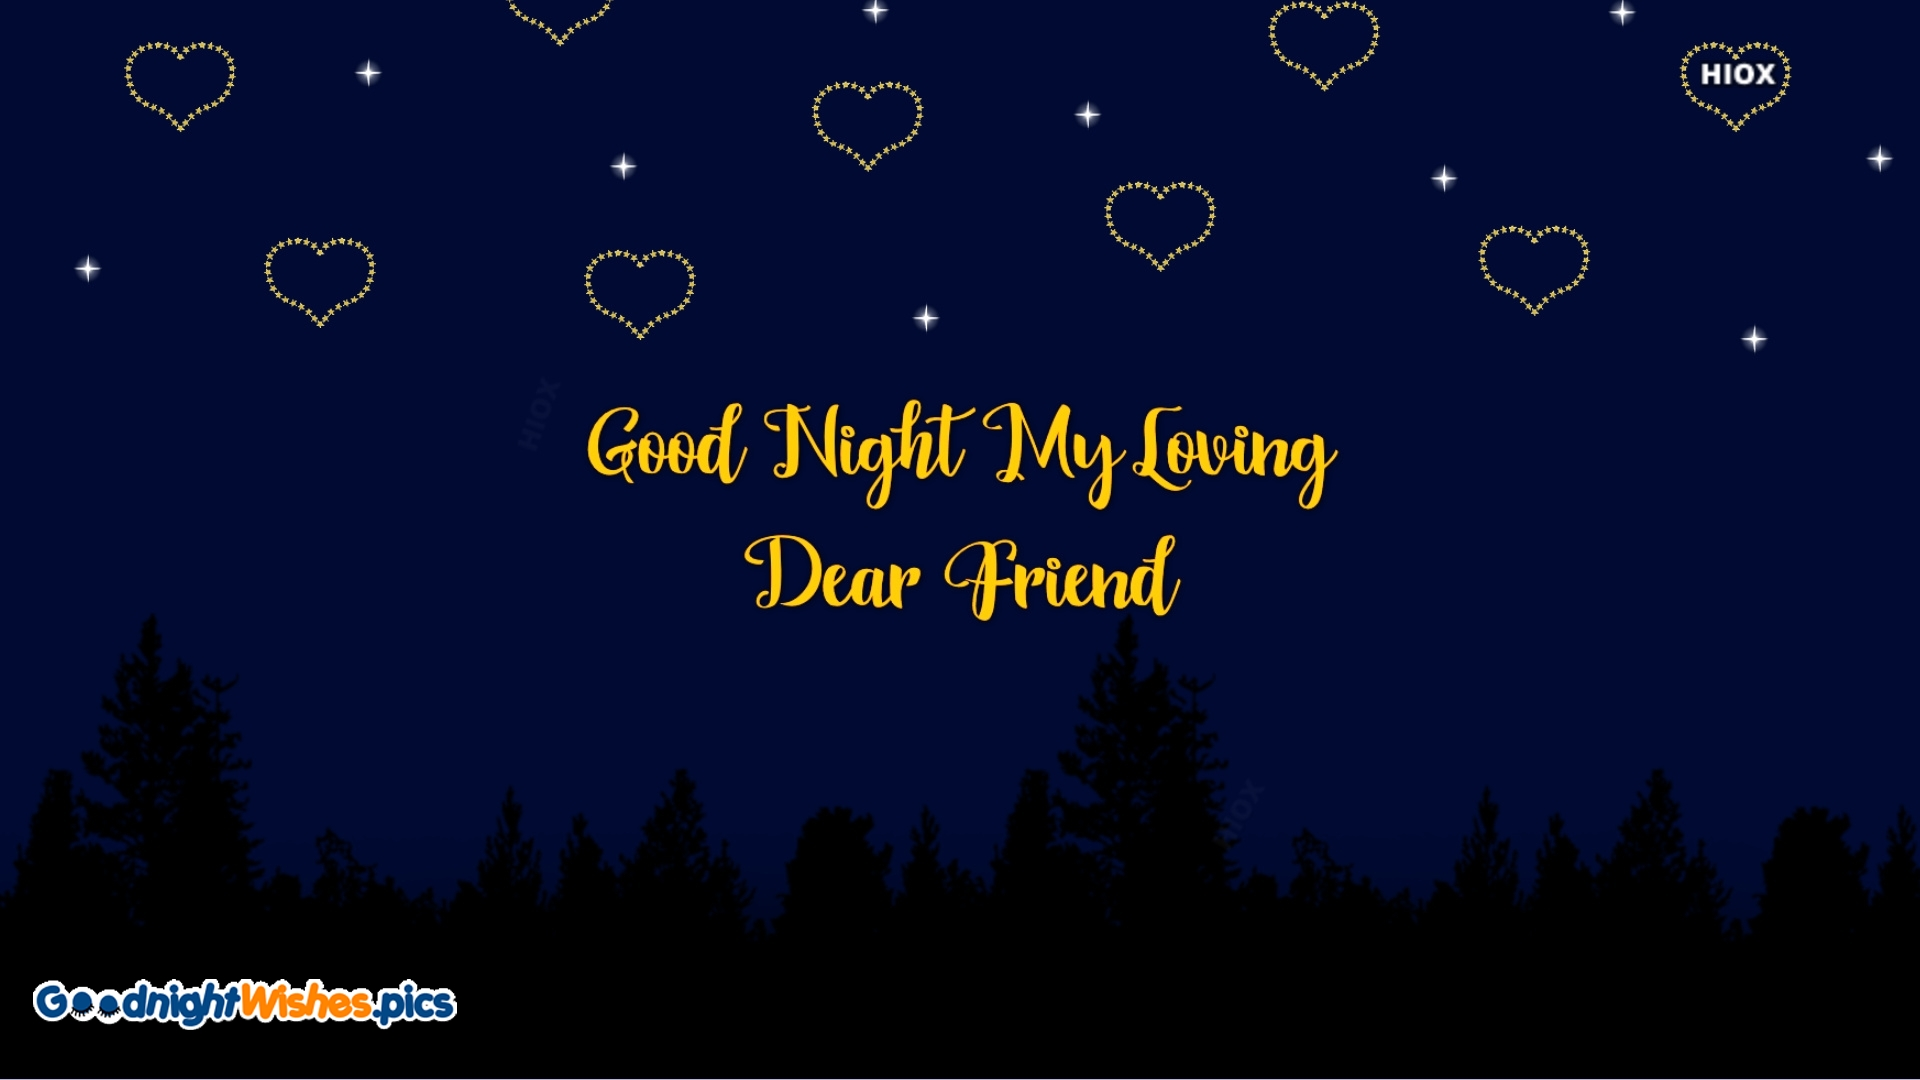 Good Night My Loving Dear Friend